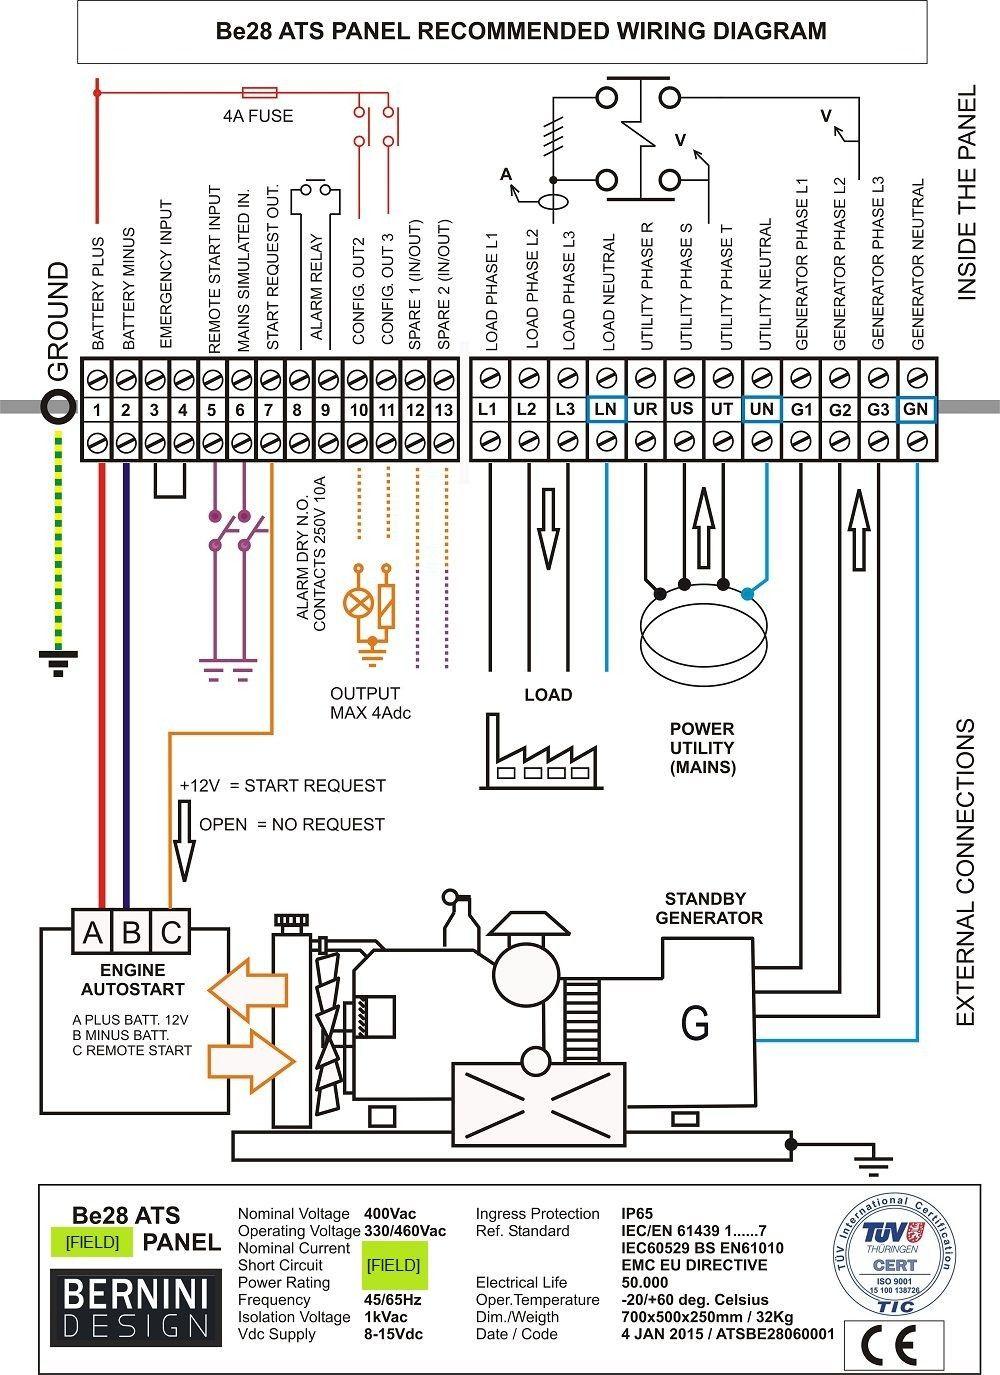 Generator Automatic Transfer Switch Wiring Diagram In 2020 Transfer Switch Generator Transfer Switch Generator House